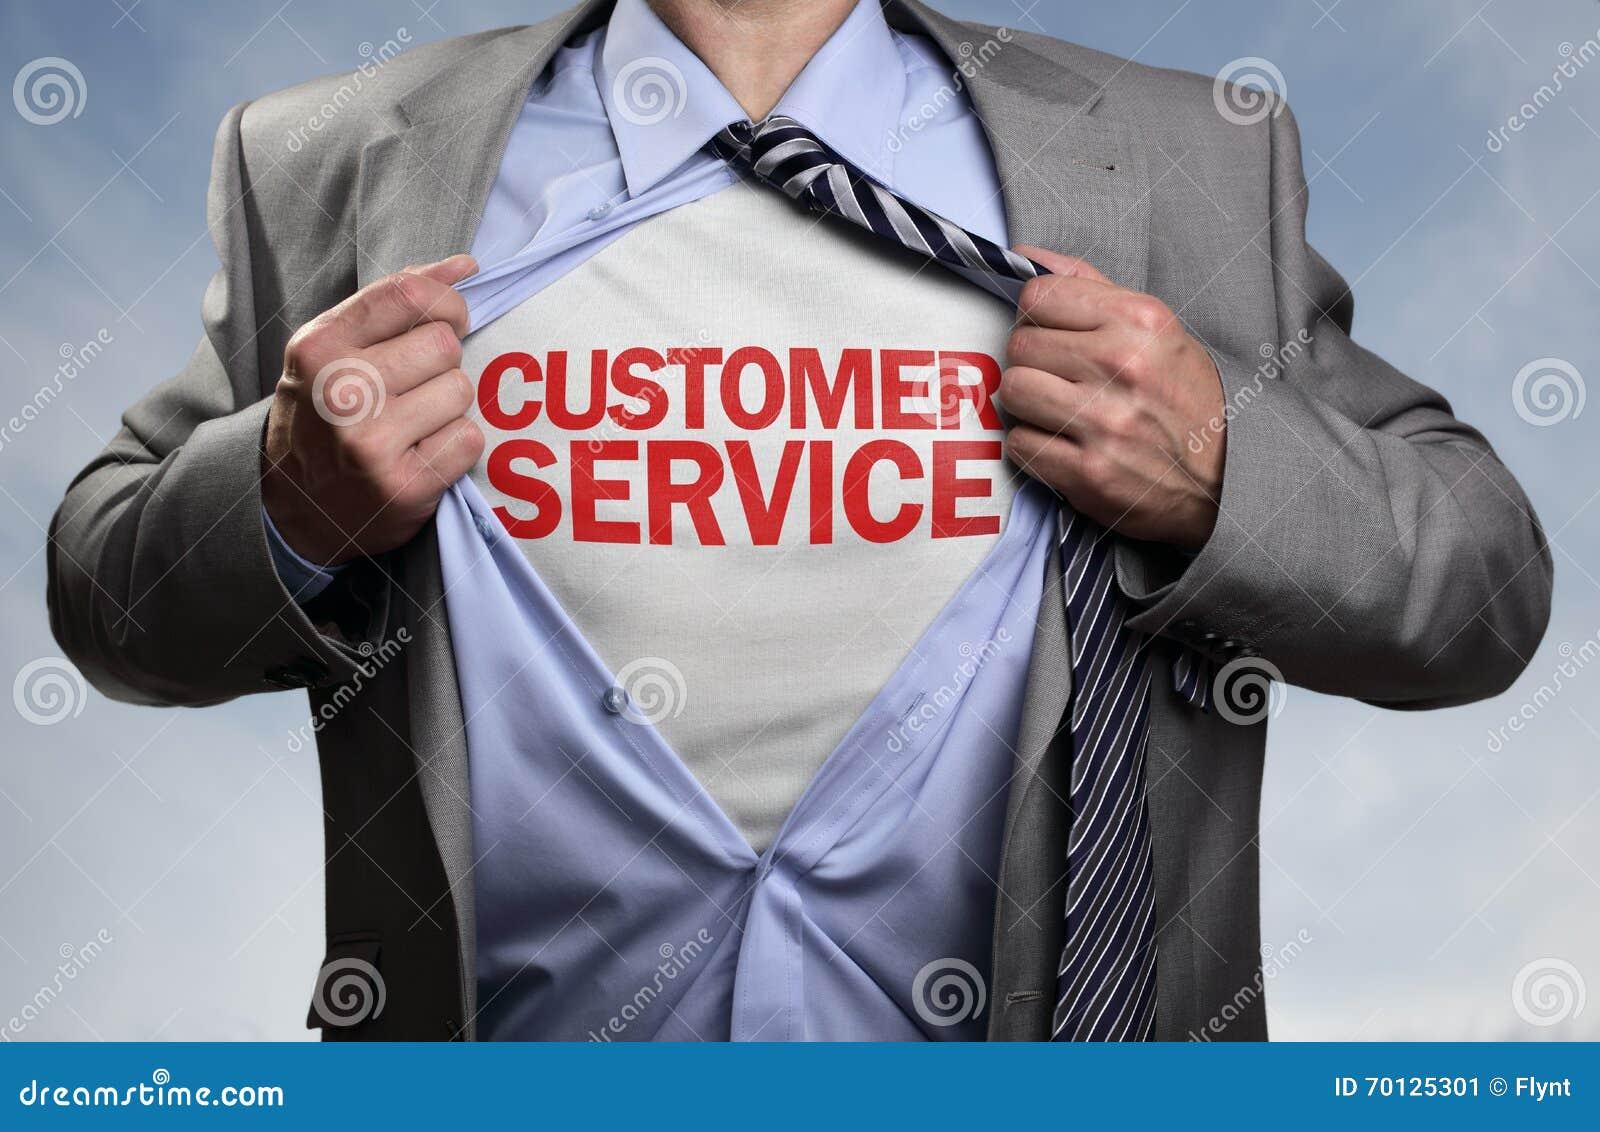 Customer service superhero